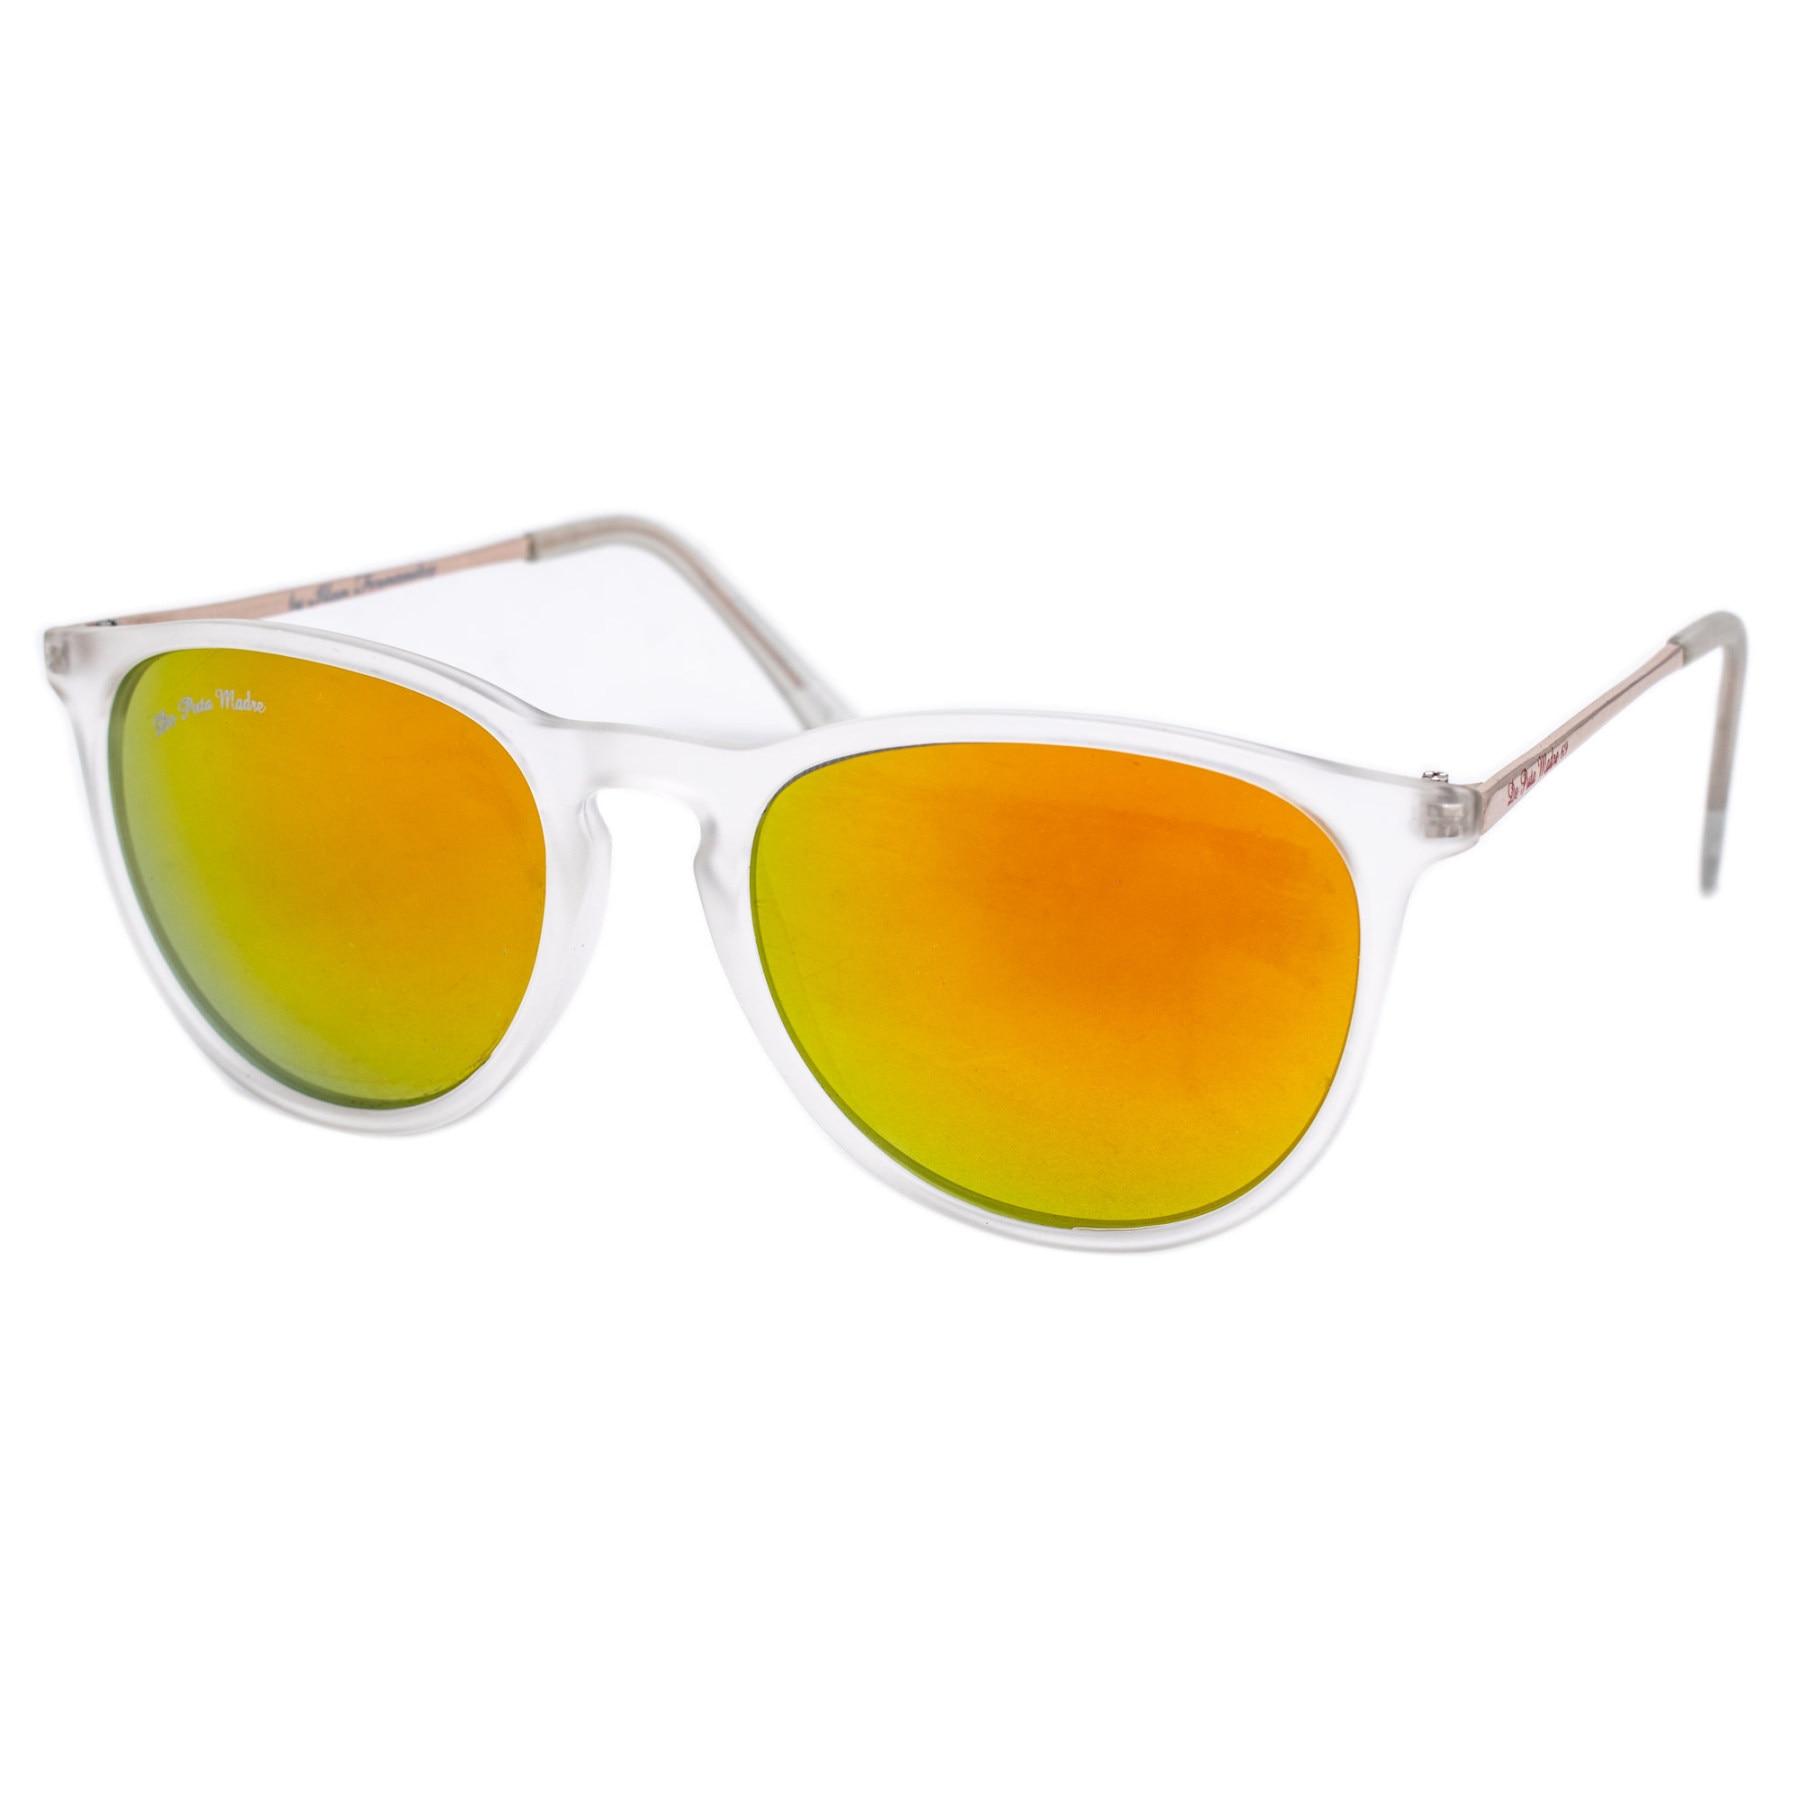 Gafas De sol Unisex De Puta Madre 69 DZ2029-S961TS (Ø 52mm)